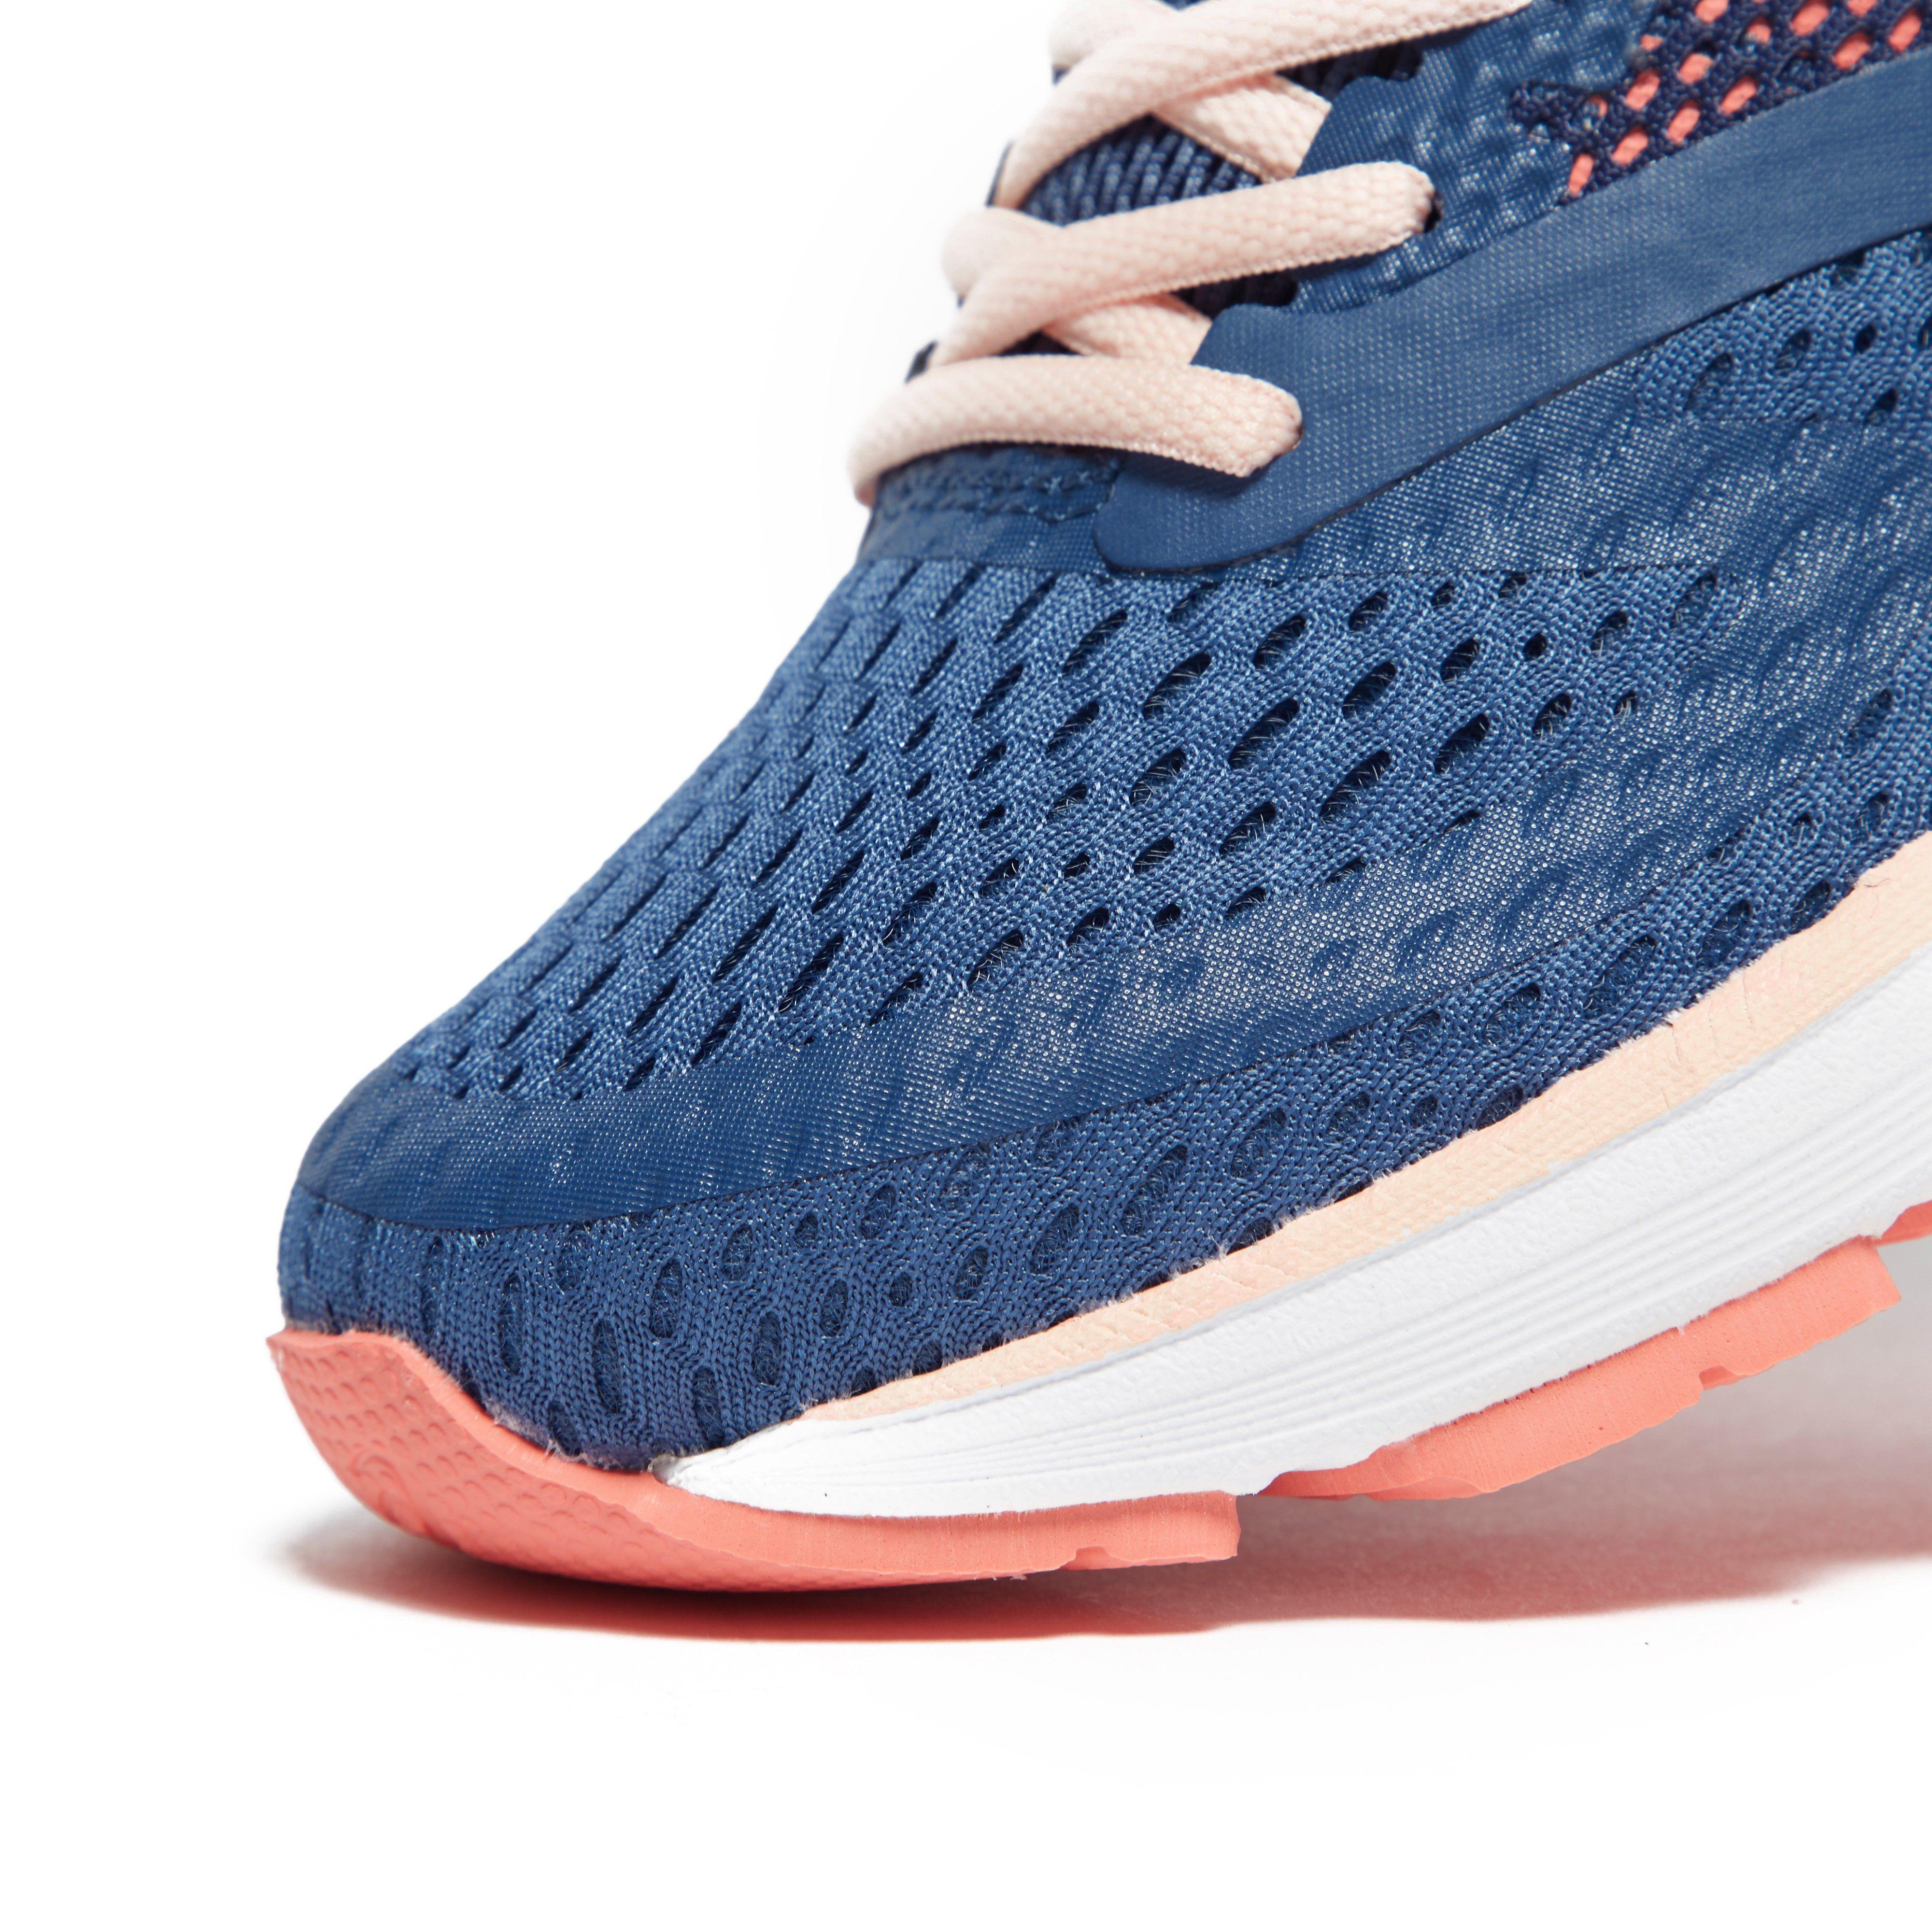 ASICS Gel-Pulse 10 Women's Running Shoes